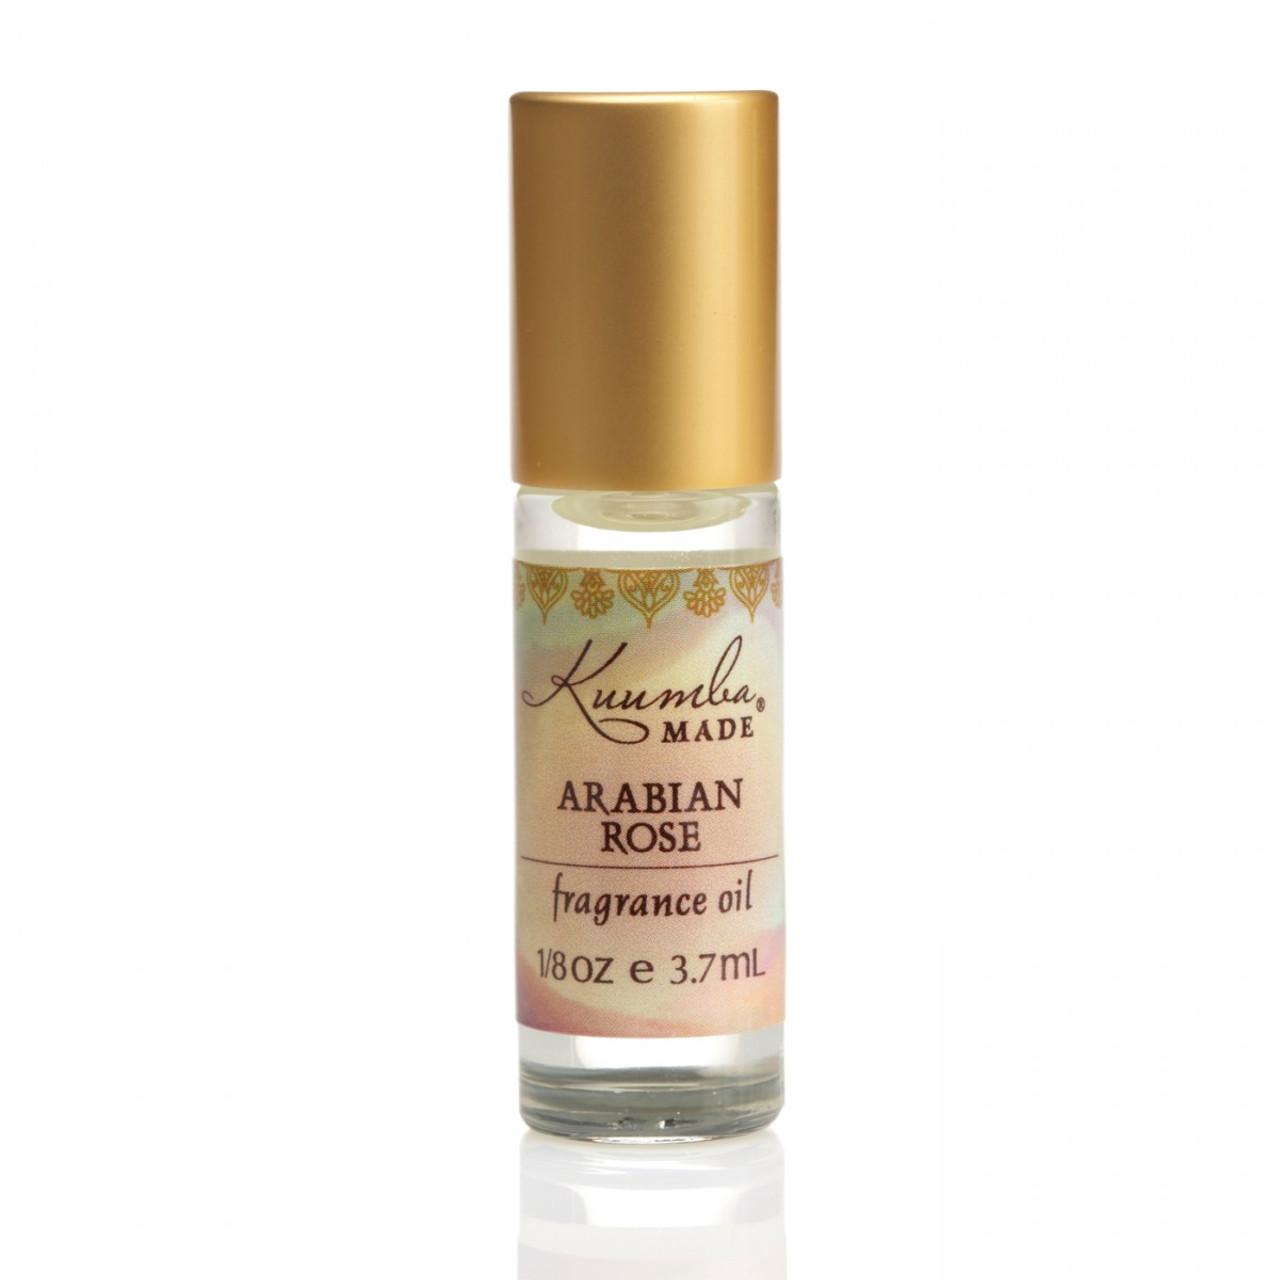 Kuumba Made Arabian Rose Fragrance Oil